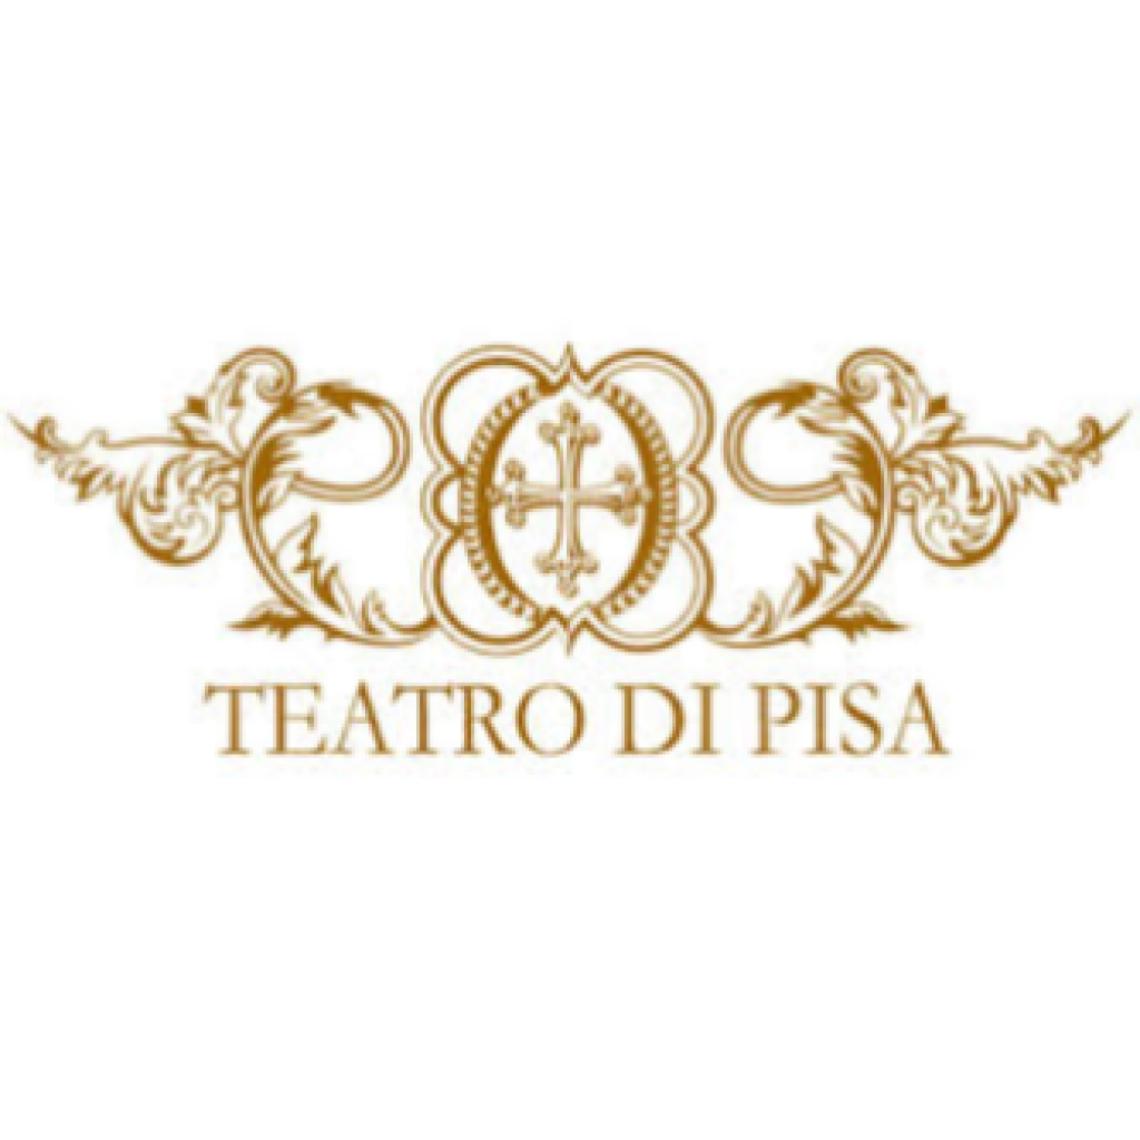 Teatropisalogo